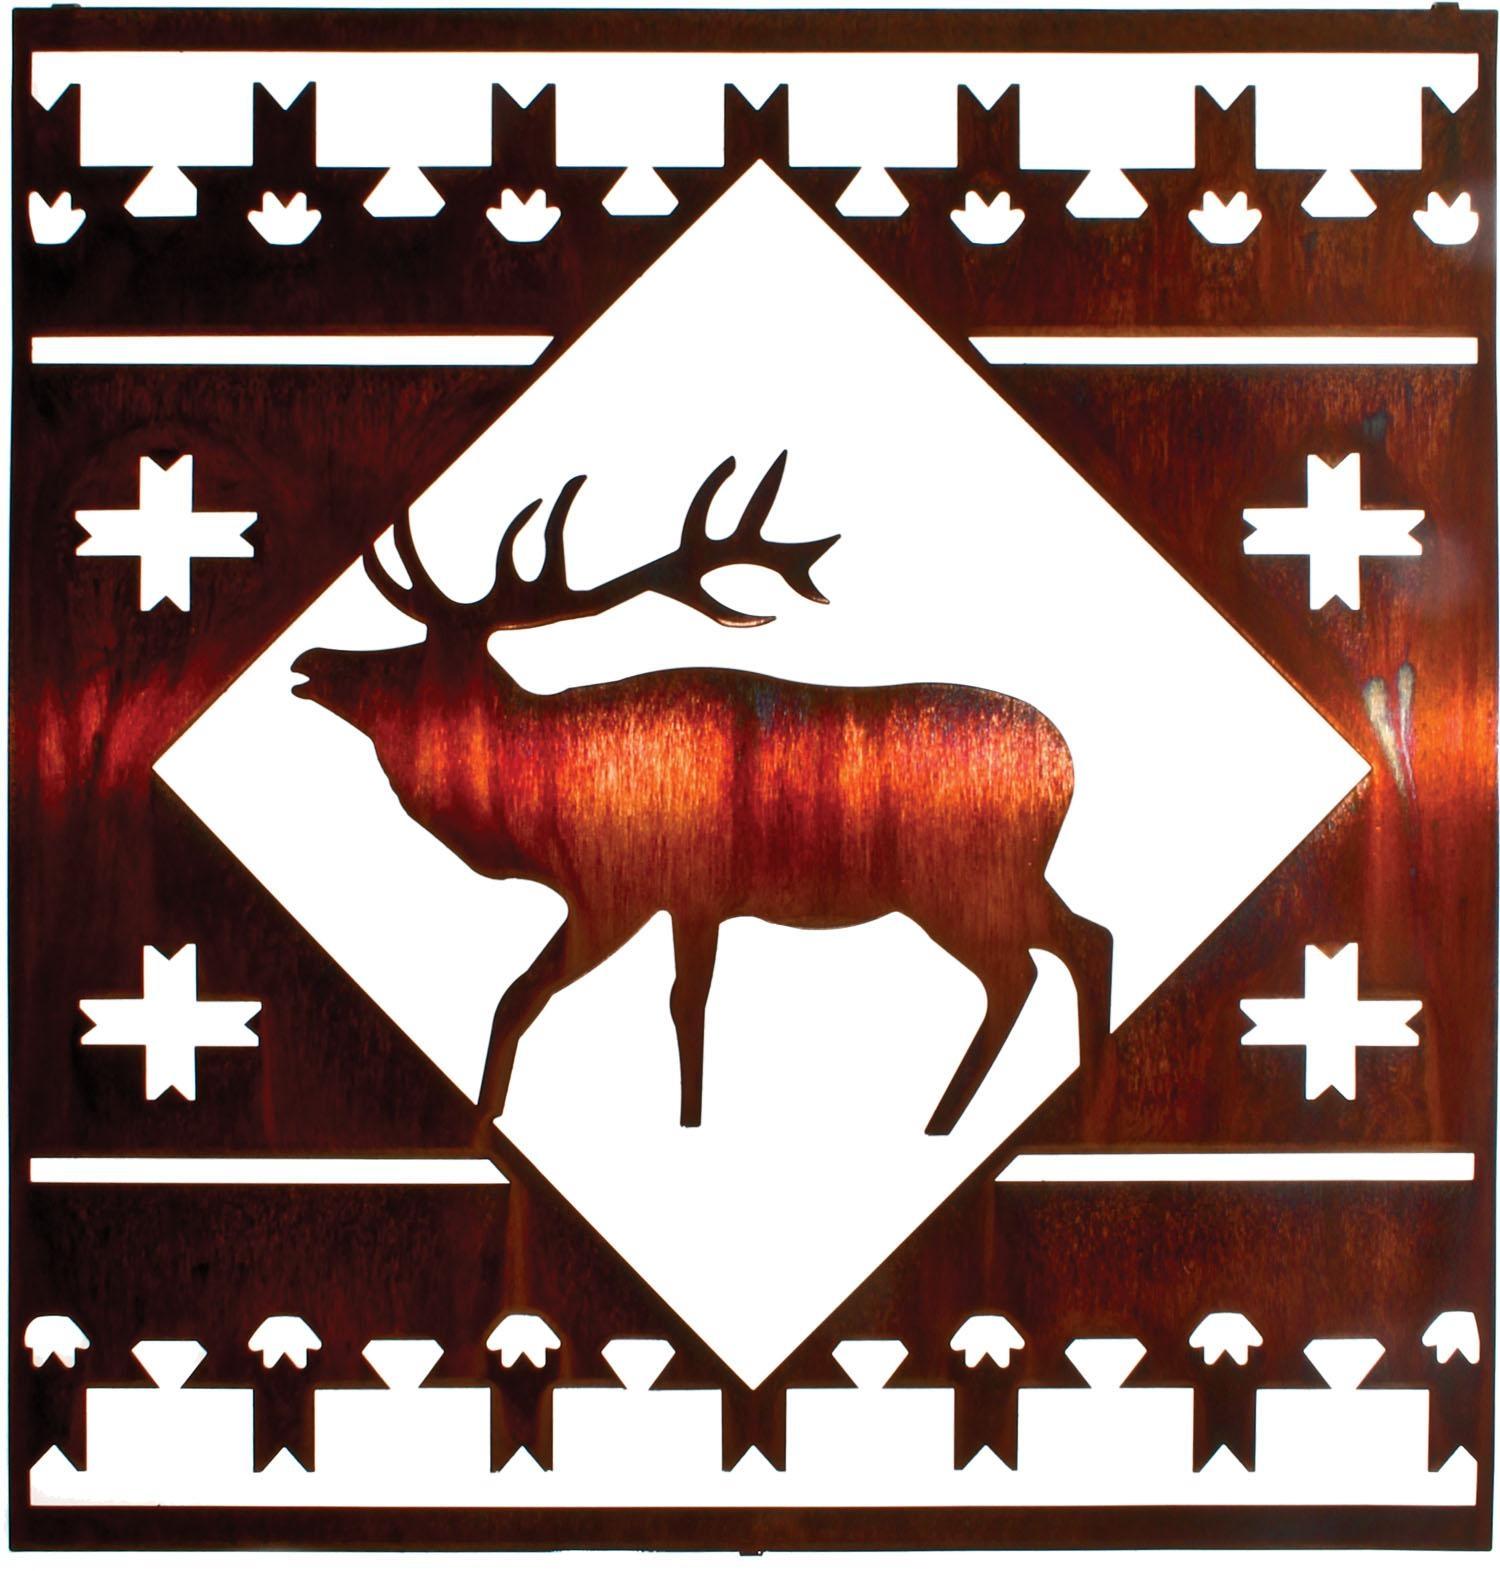 Elk Lodge Square Best Sellerlazart – Sanger Metal Art And Gifts Inside Lazart Metal Art (View 16 of 20)